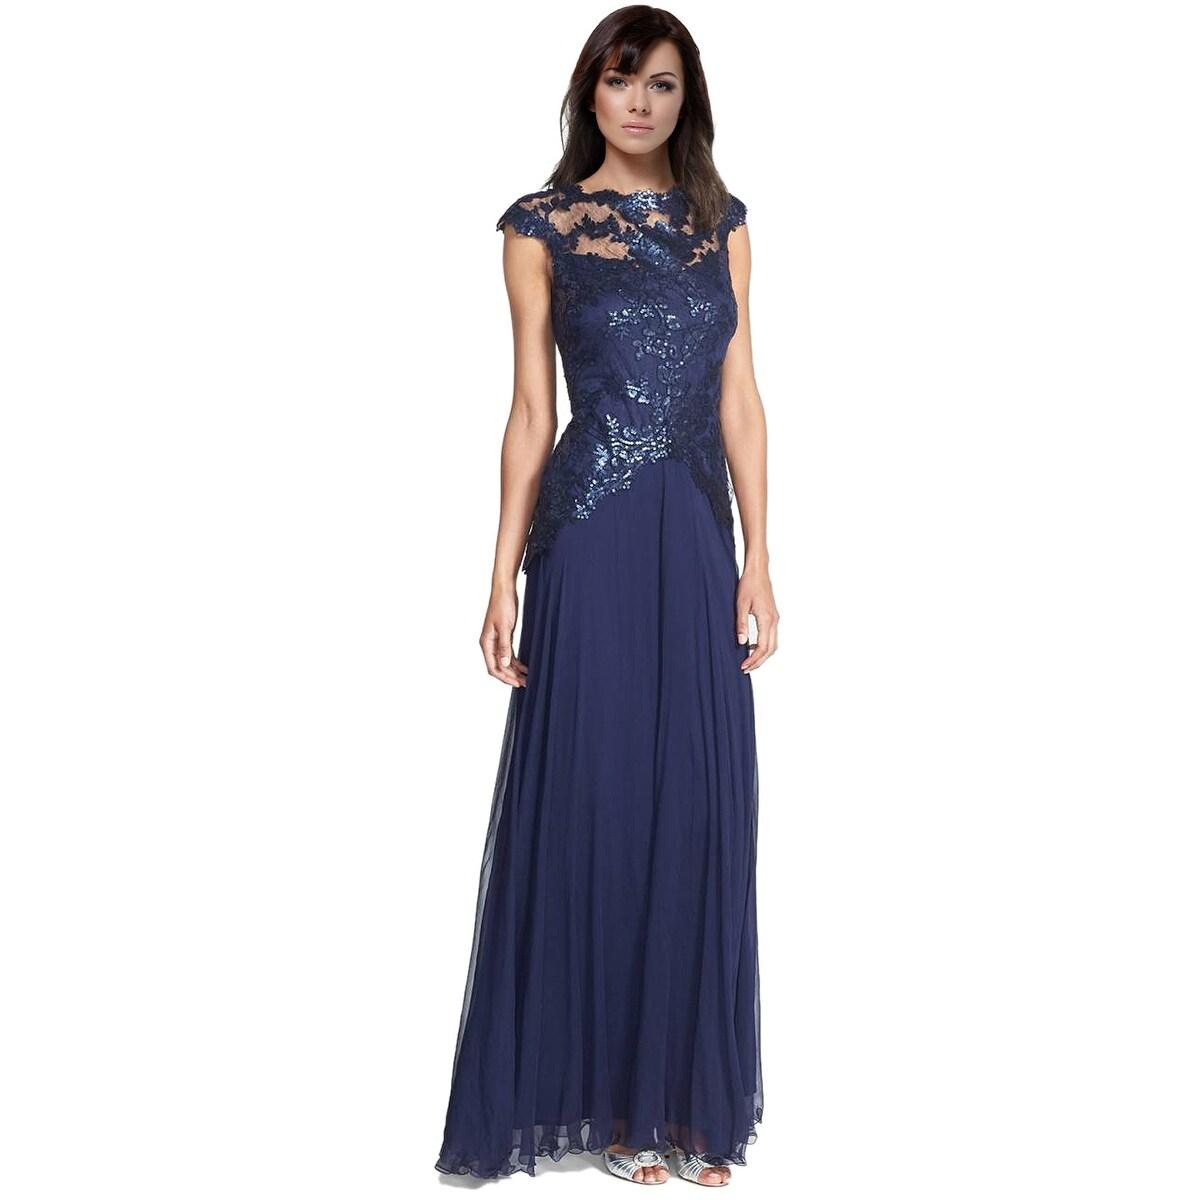 Shop Tadashi Shoji Sequined Lace Cap Sleeve Evening Gown Dress ...